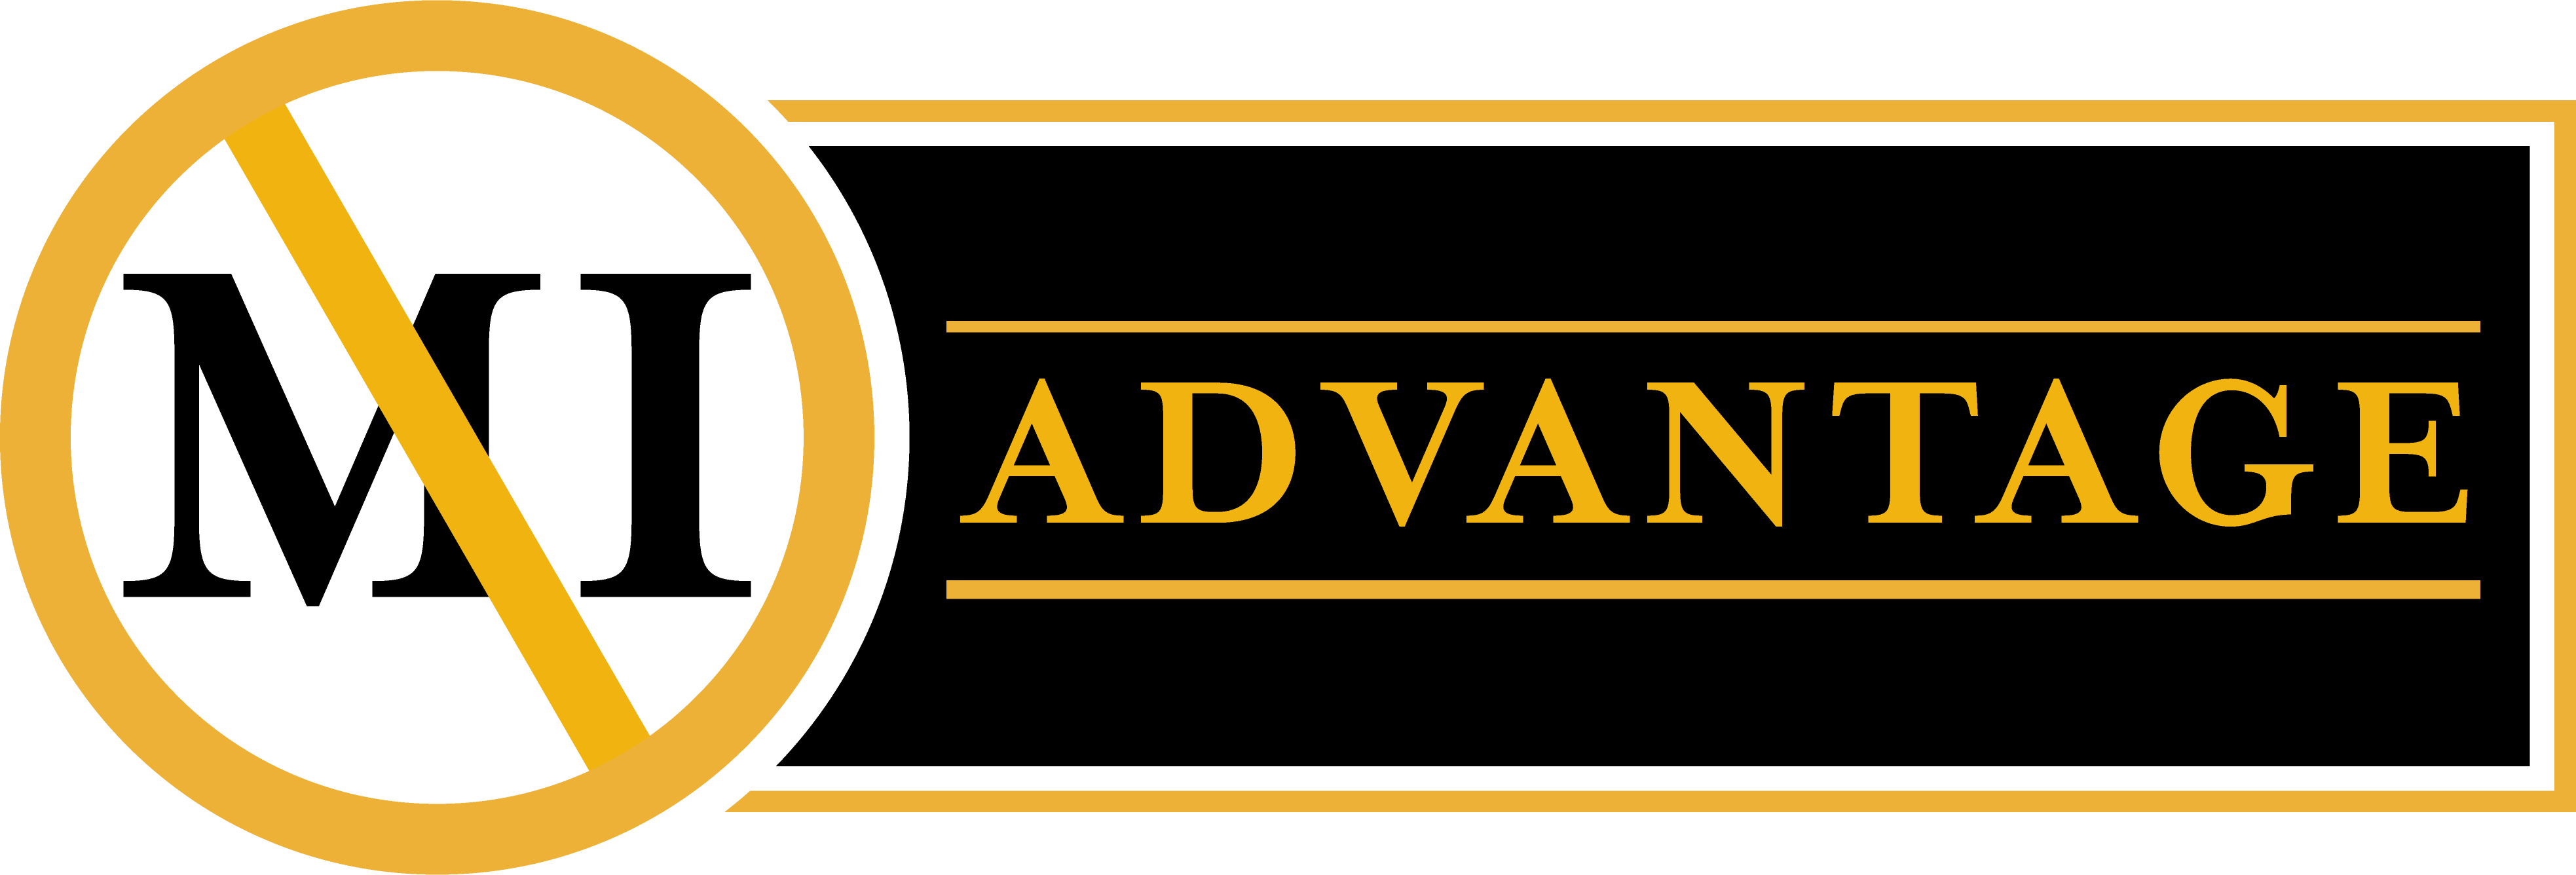 No MI Advantage-2